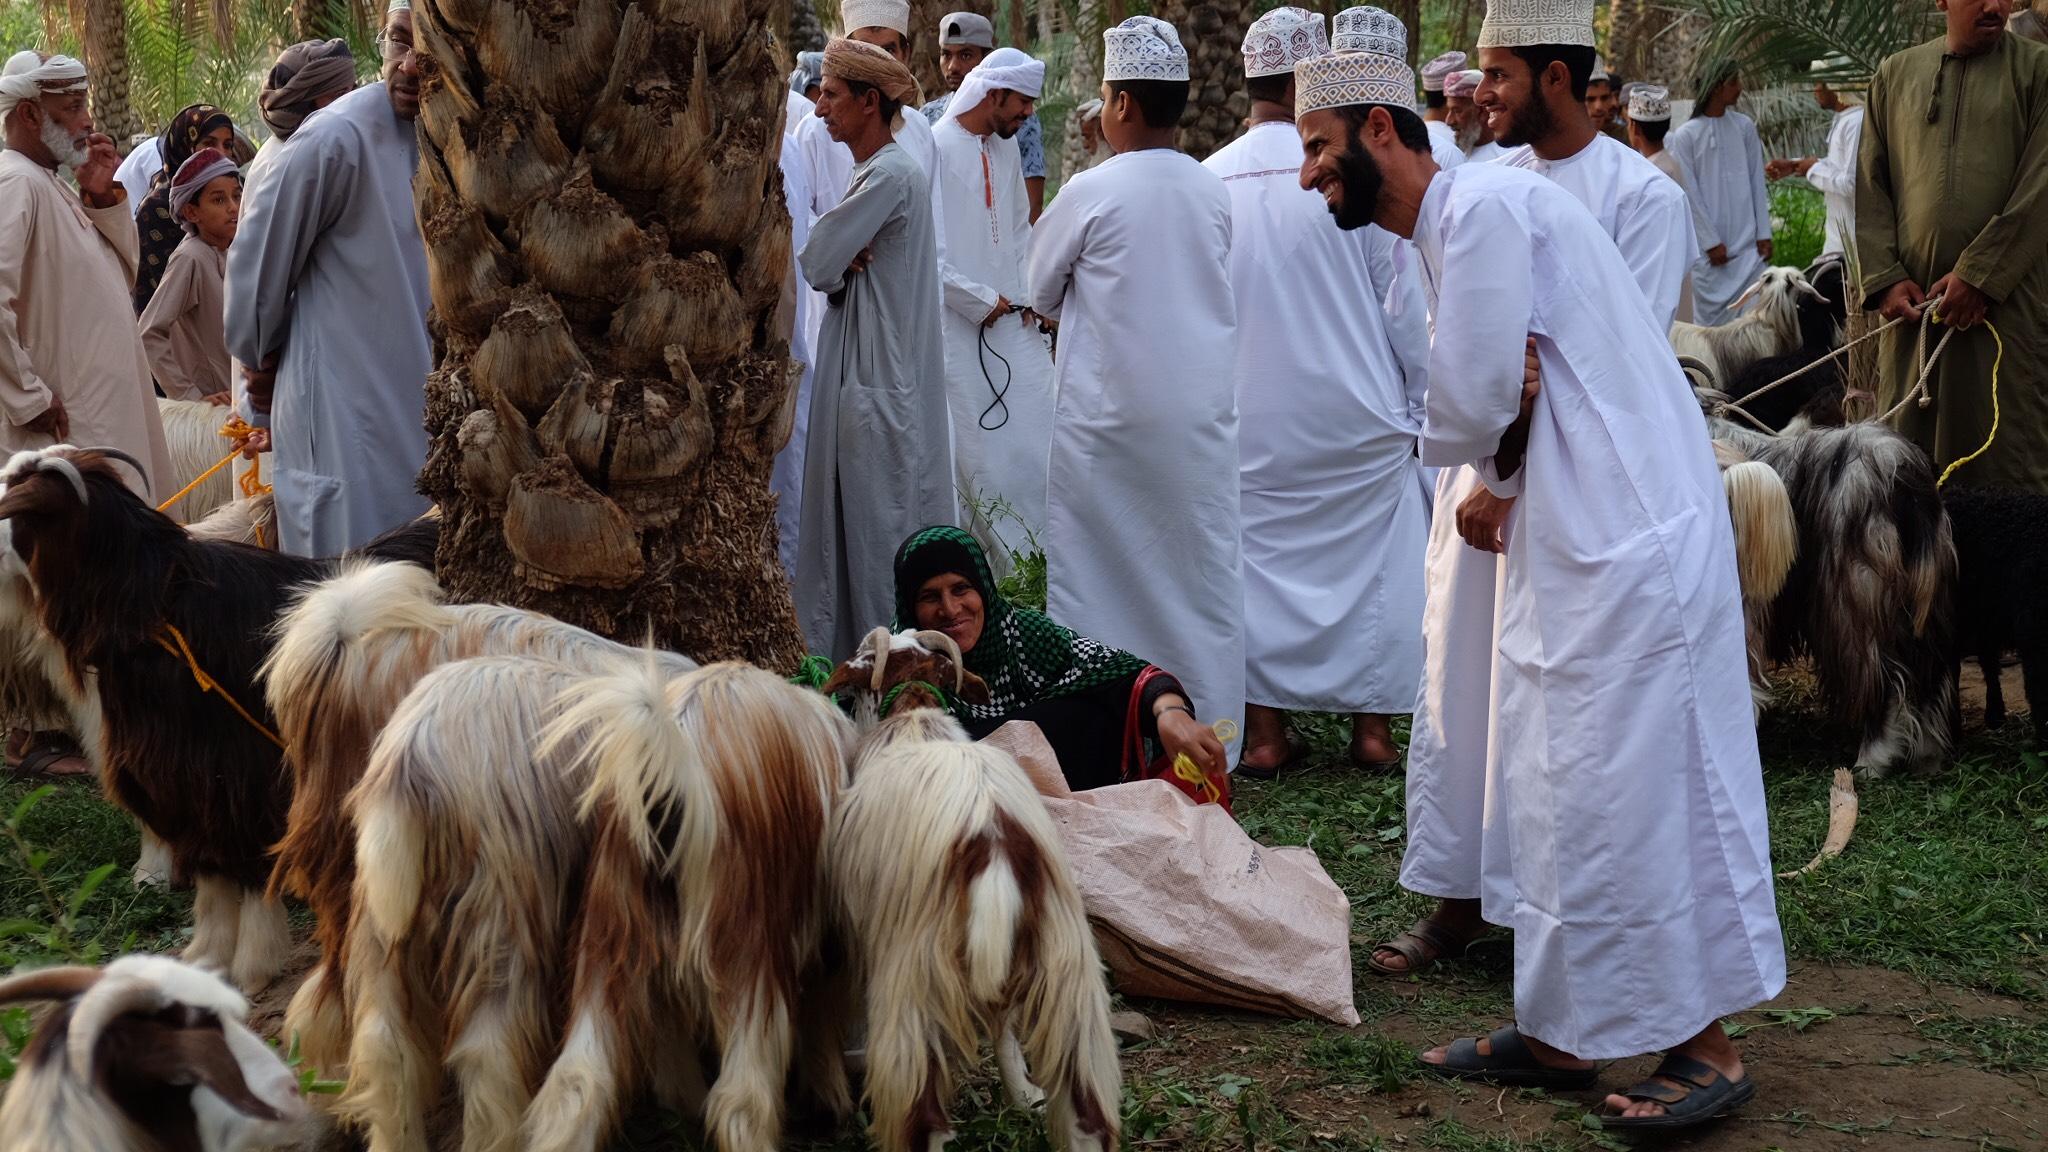 Shoppers flock to Habta markets in Oman